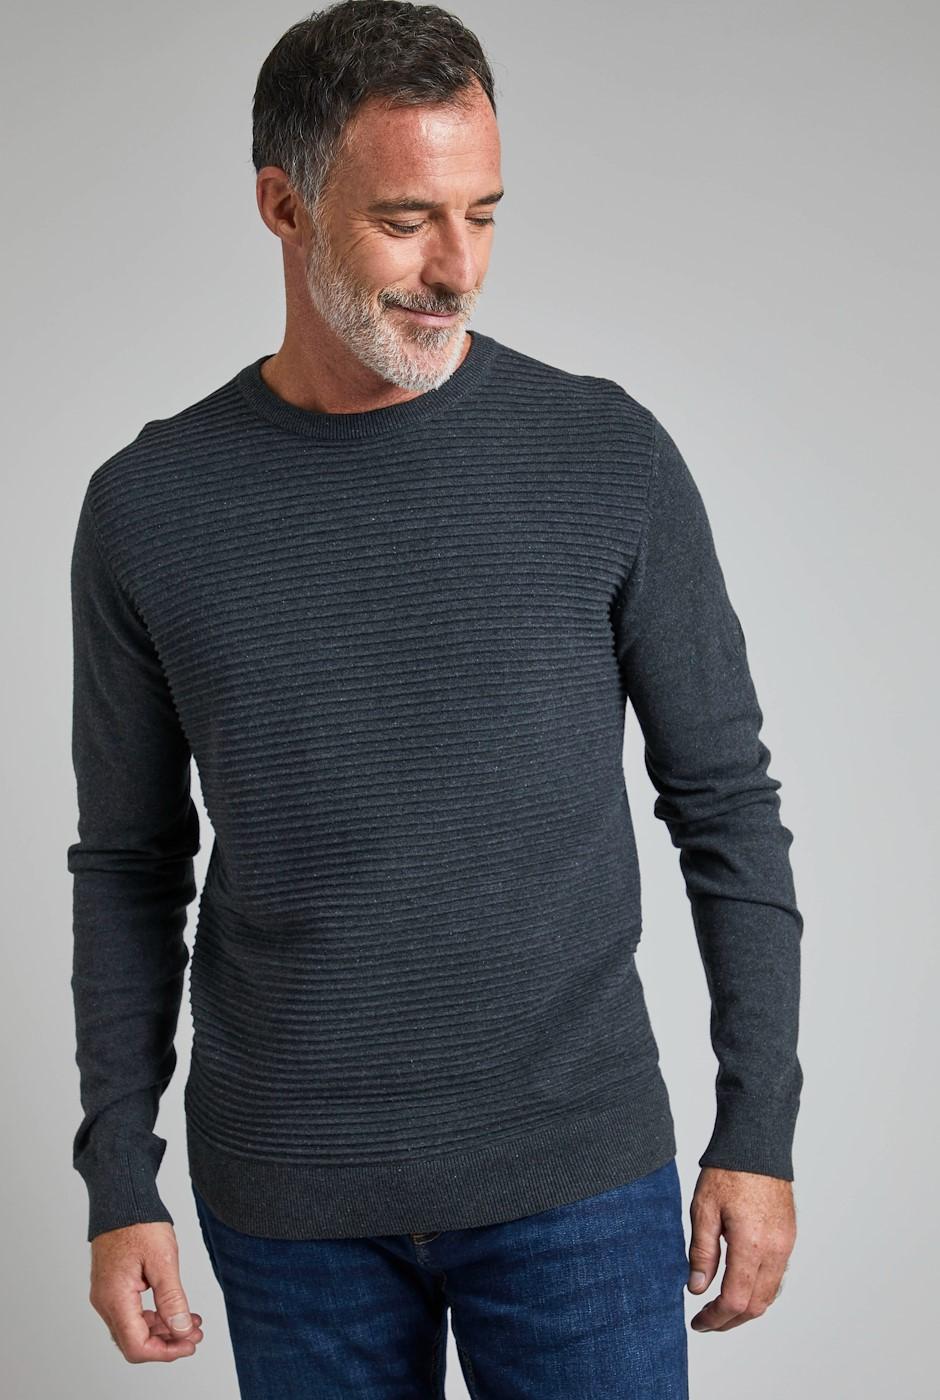 Kilkenny Ripple Stitch Jumper Grey